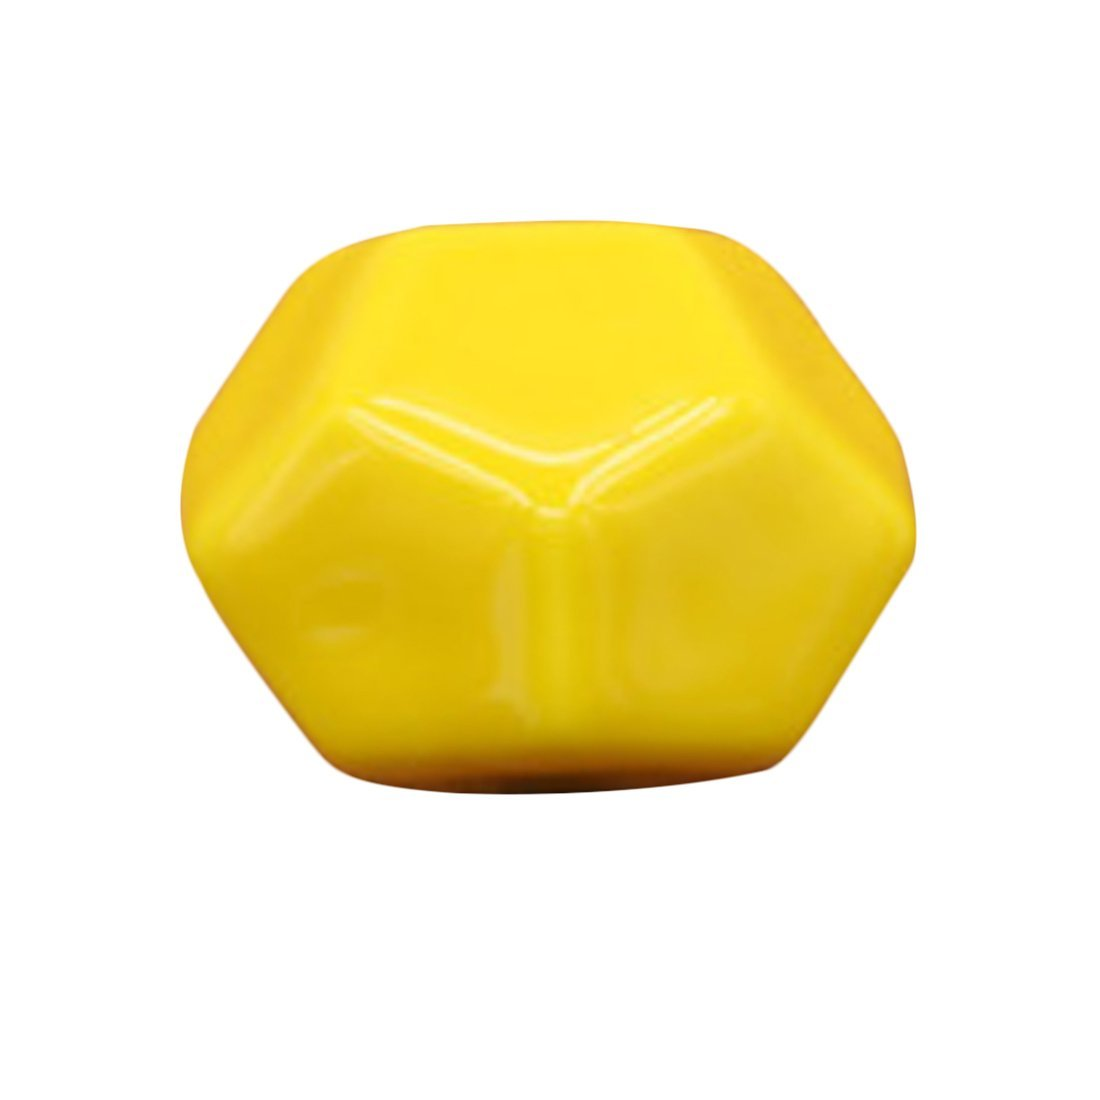 c6ac1f5590bf Get Quotations · XSHION Cute Pentagon Shape Ceramic Door Cabinet Cupboard  Knobs Wardrobe Drawer Pull Handle - Yellow